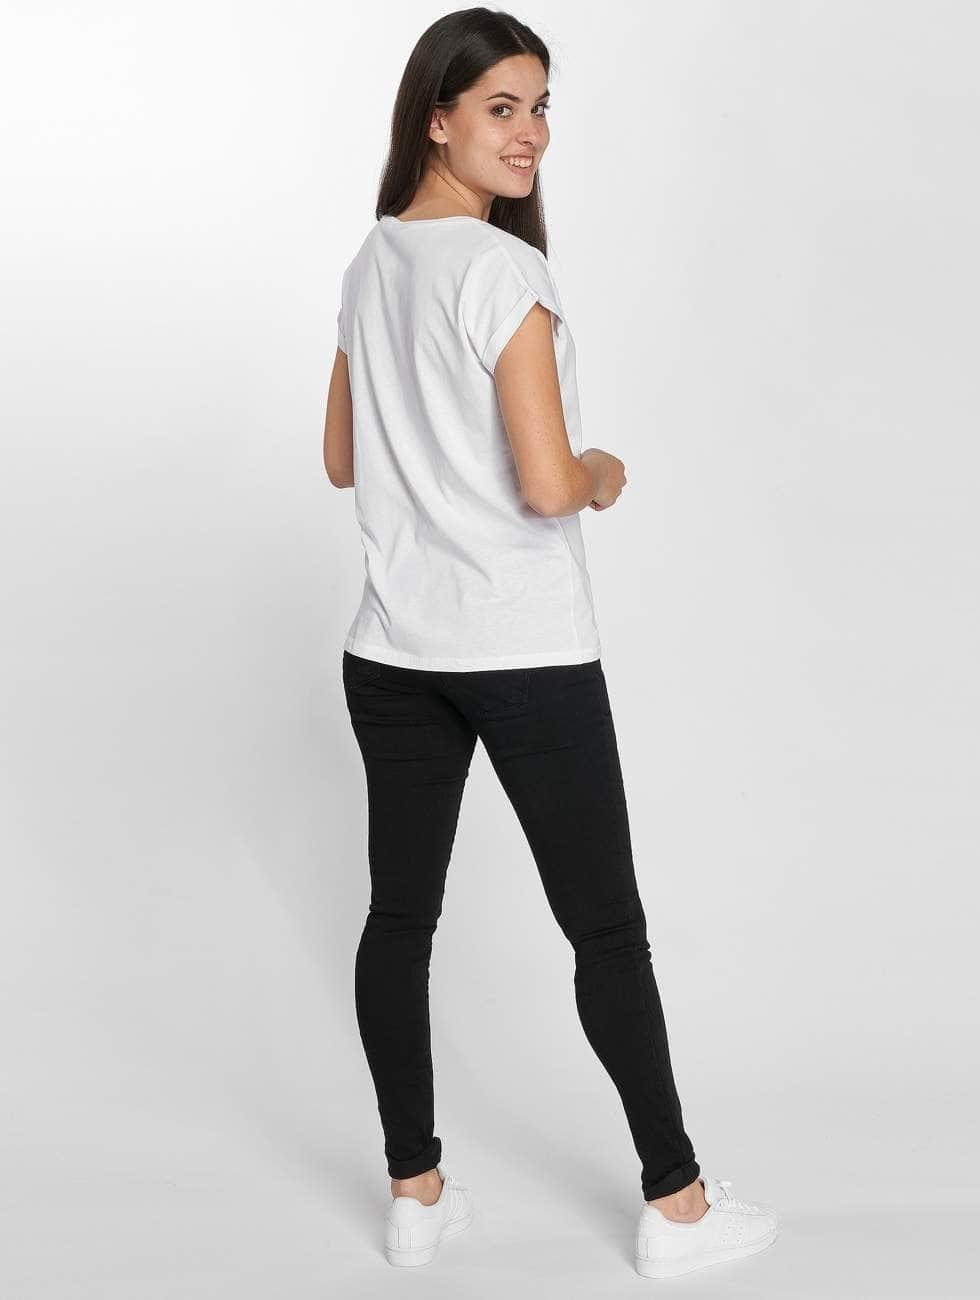 Merchcode T-shirts Betty Boop Red Dress hvid